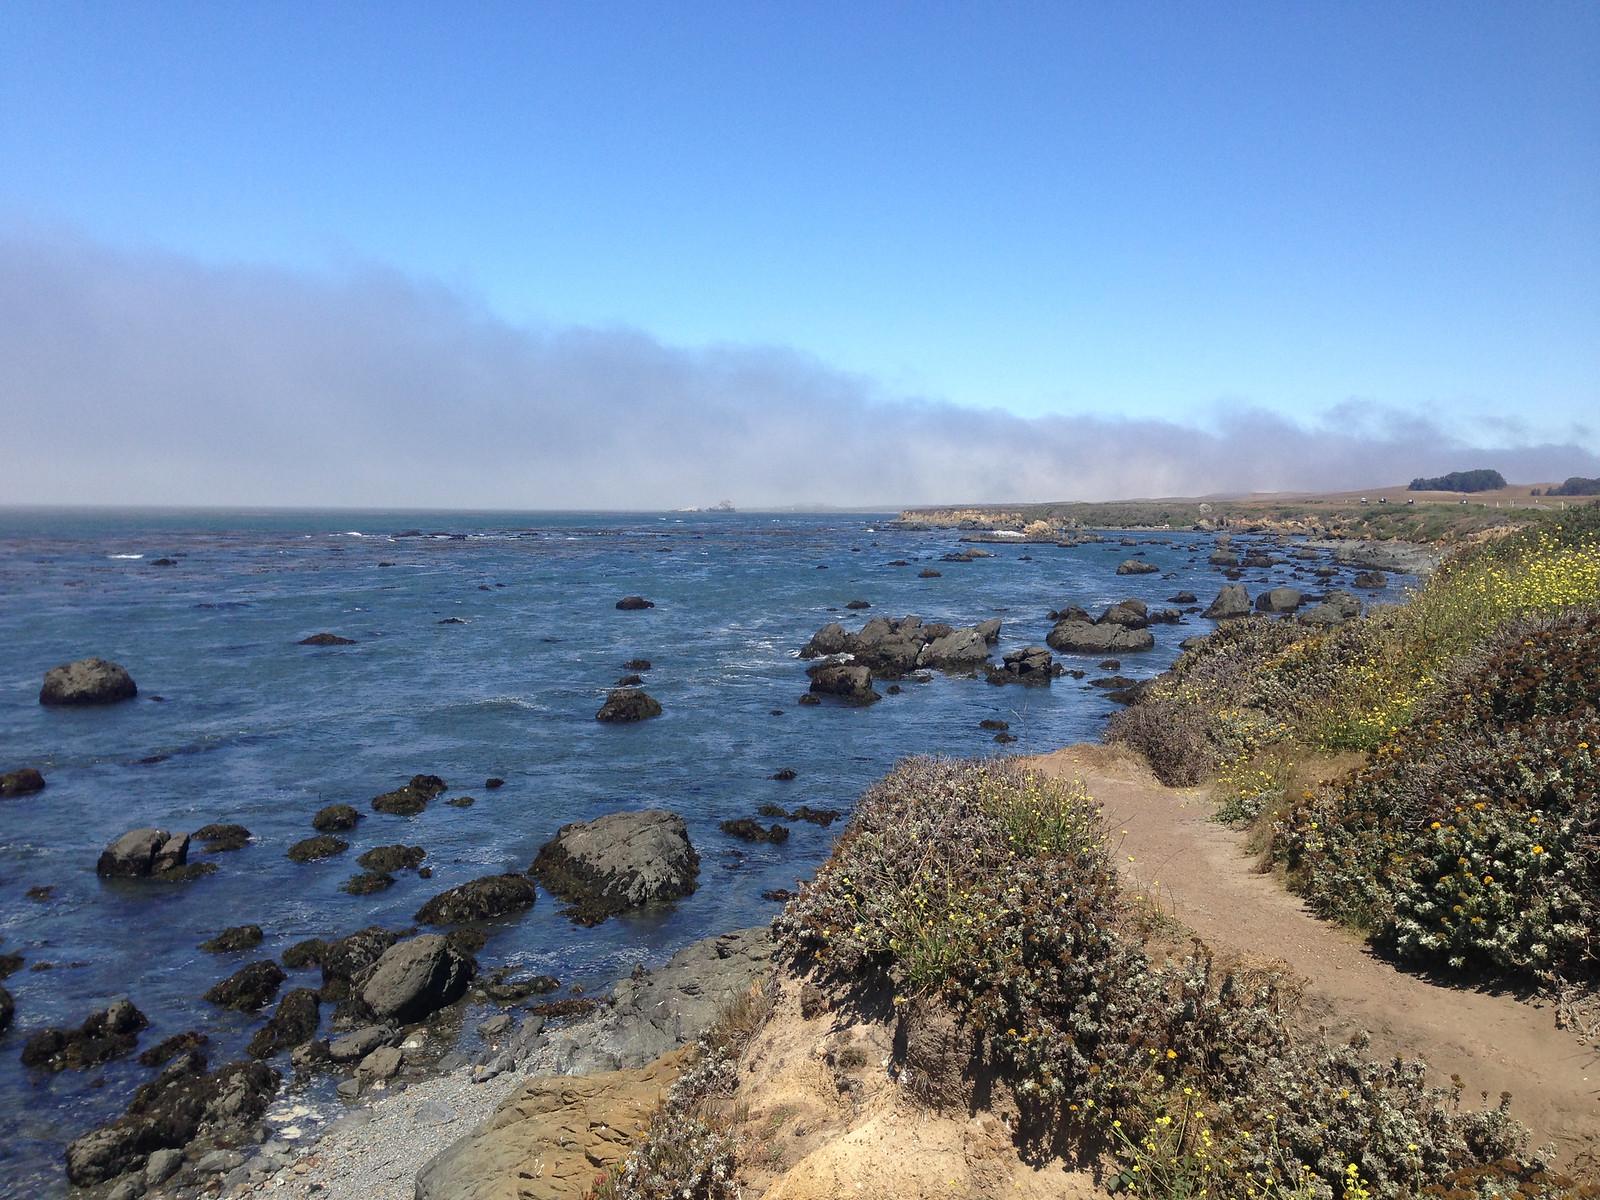 Pacific Coast Highway, California